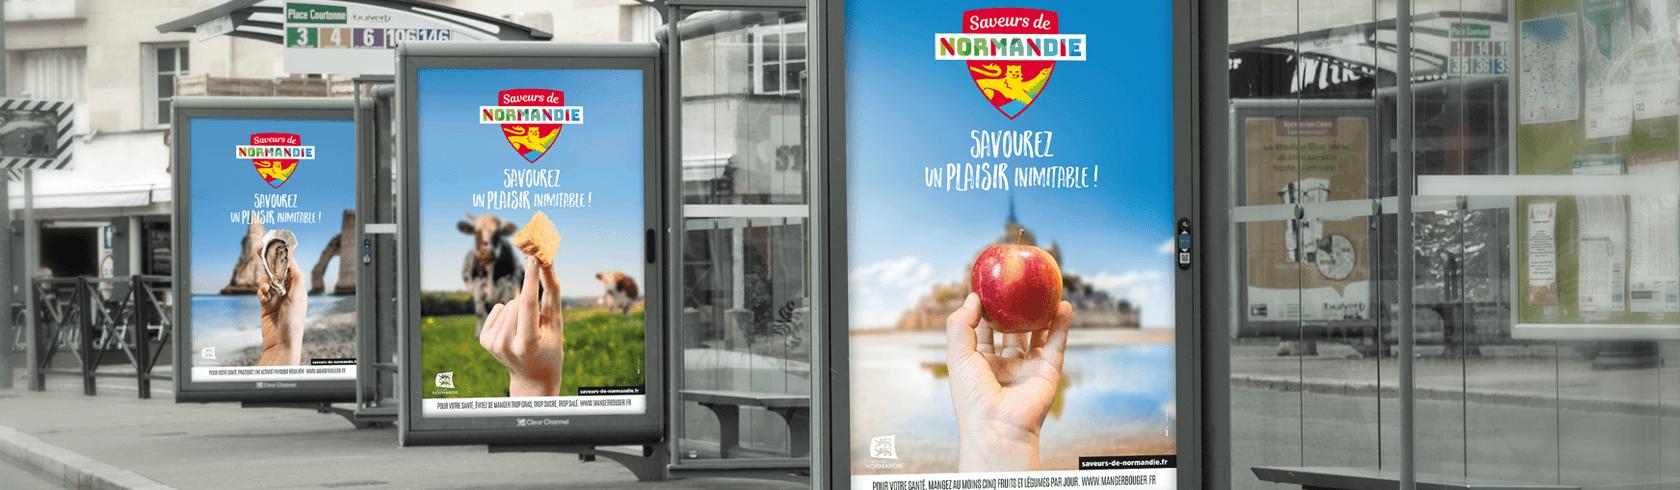 slide-affiches-saveurs-normandie